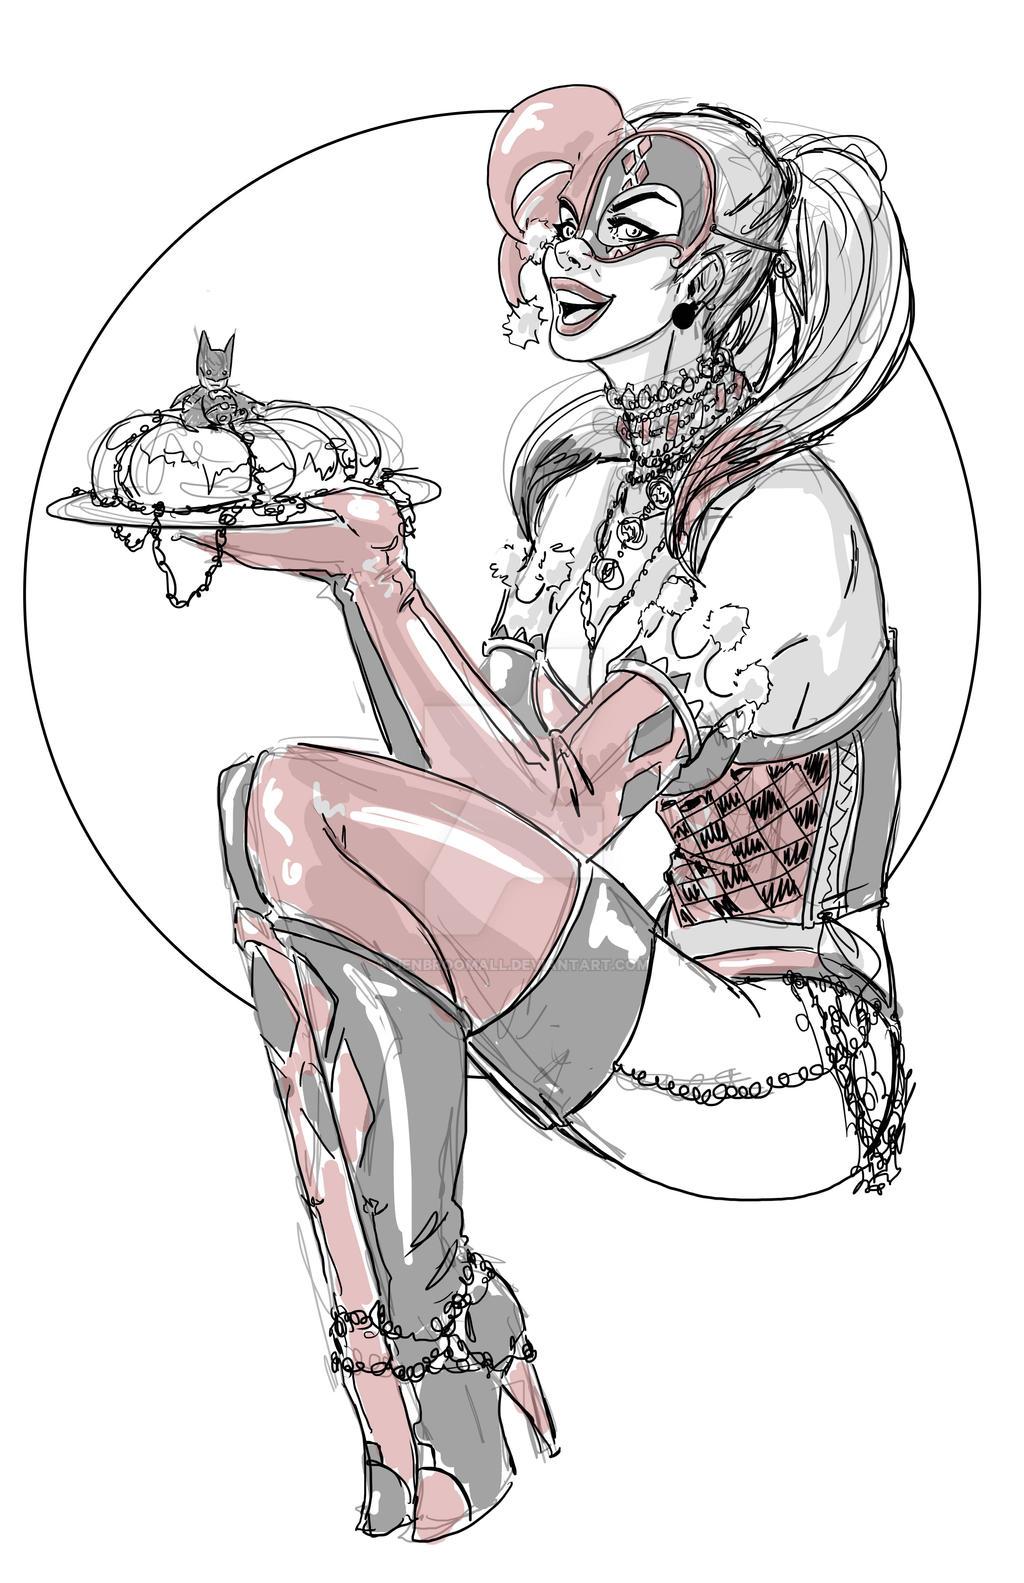 Mardi Harley by JenBroomall